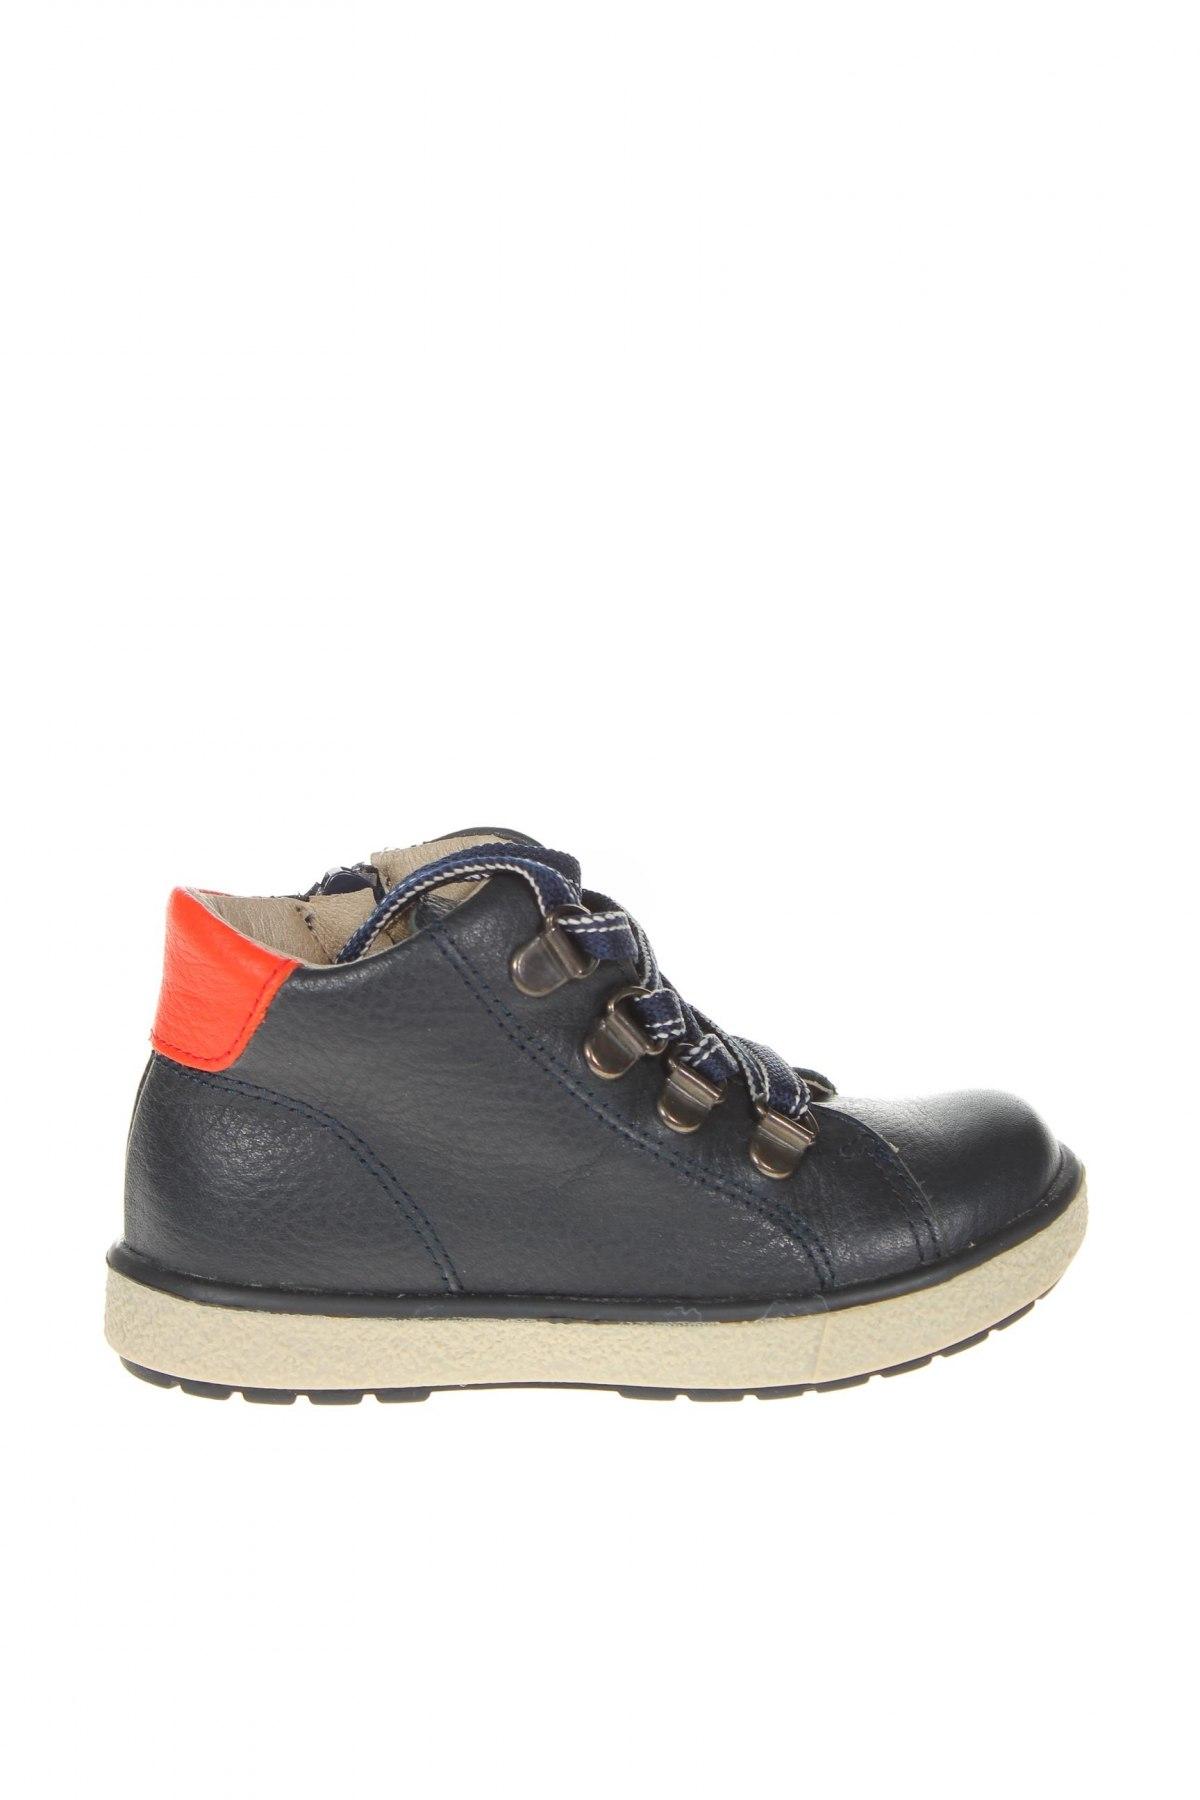 Детски обувки Pablosky, Размер 24, Цвят Син, Естествена кожа, Цена 96,75лв.